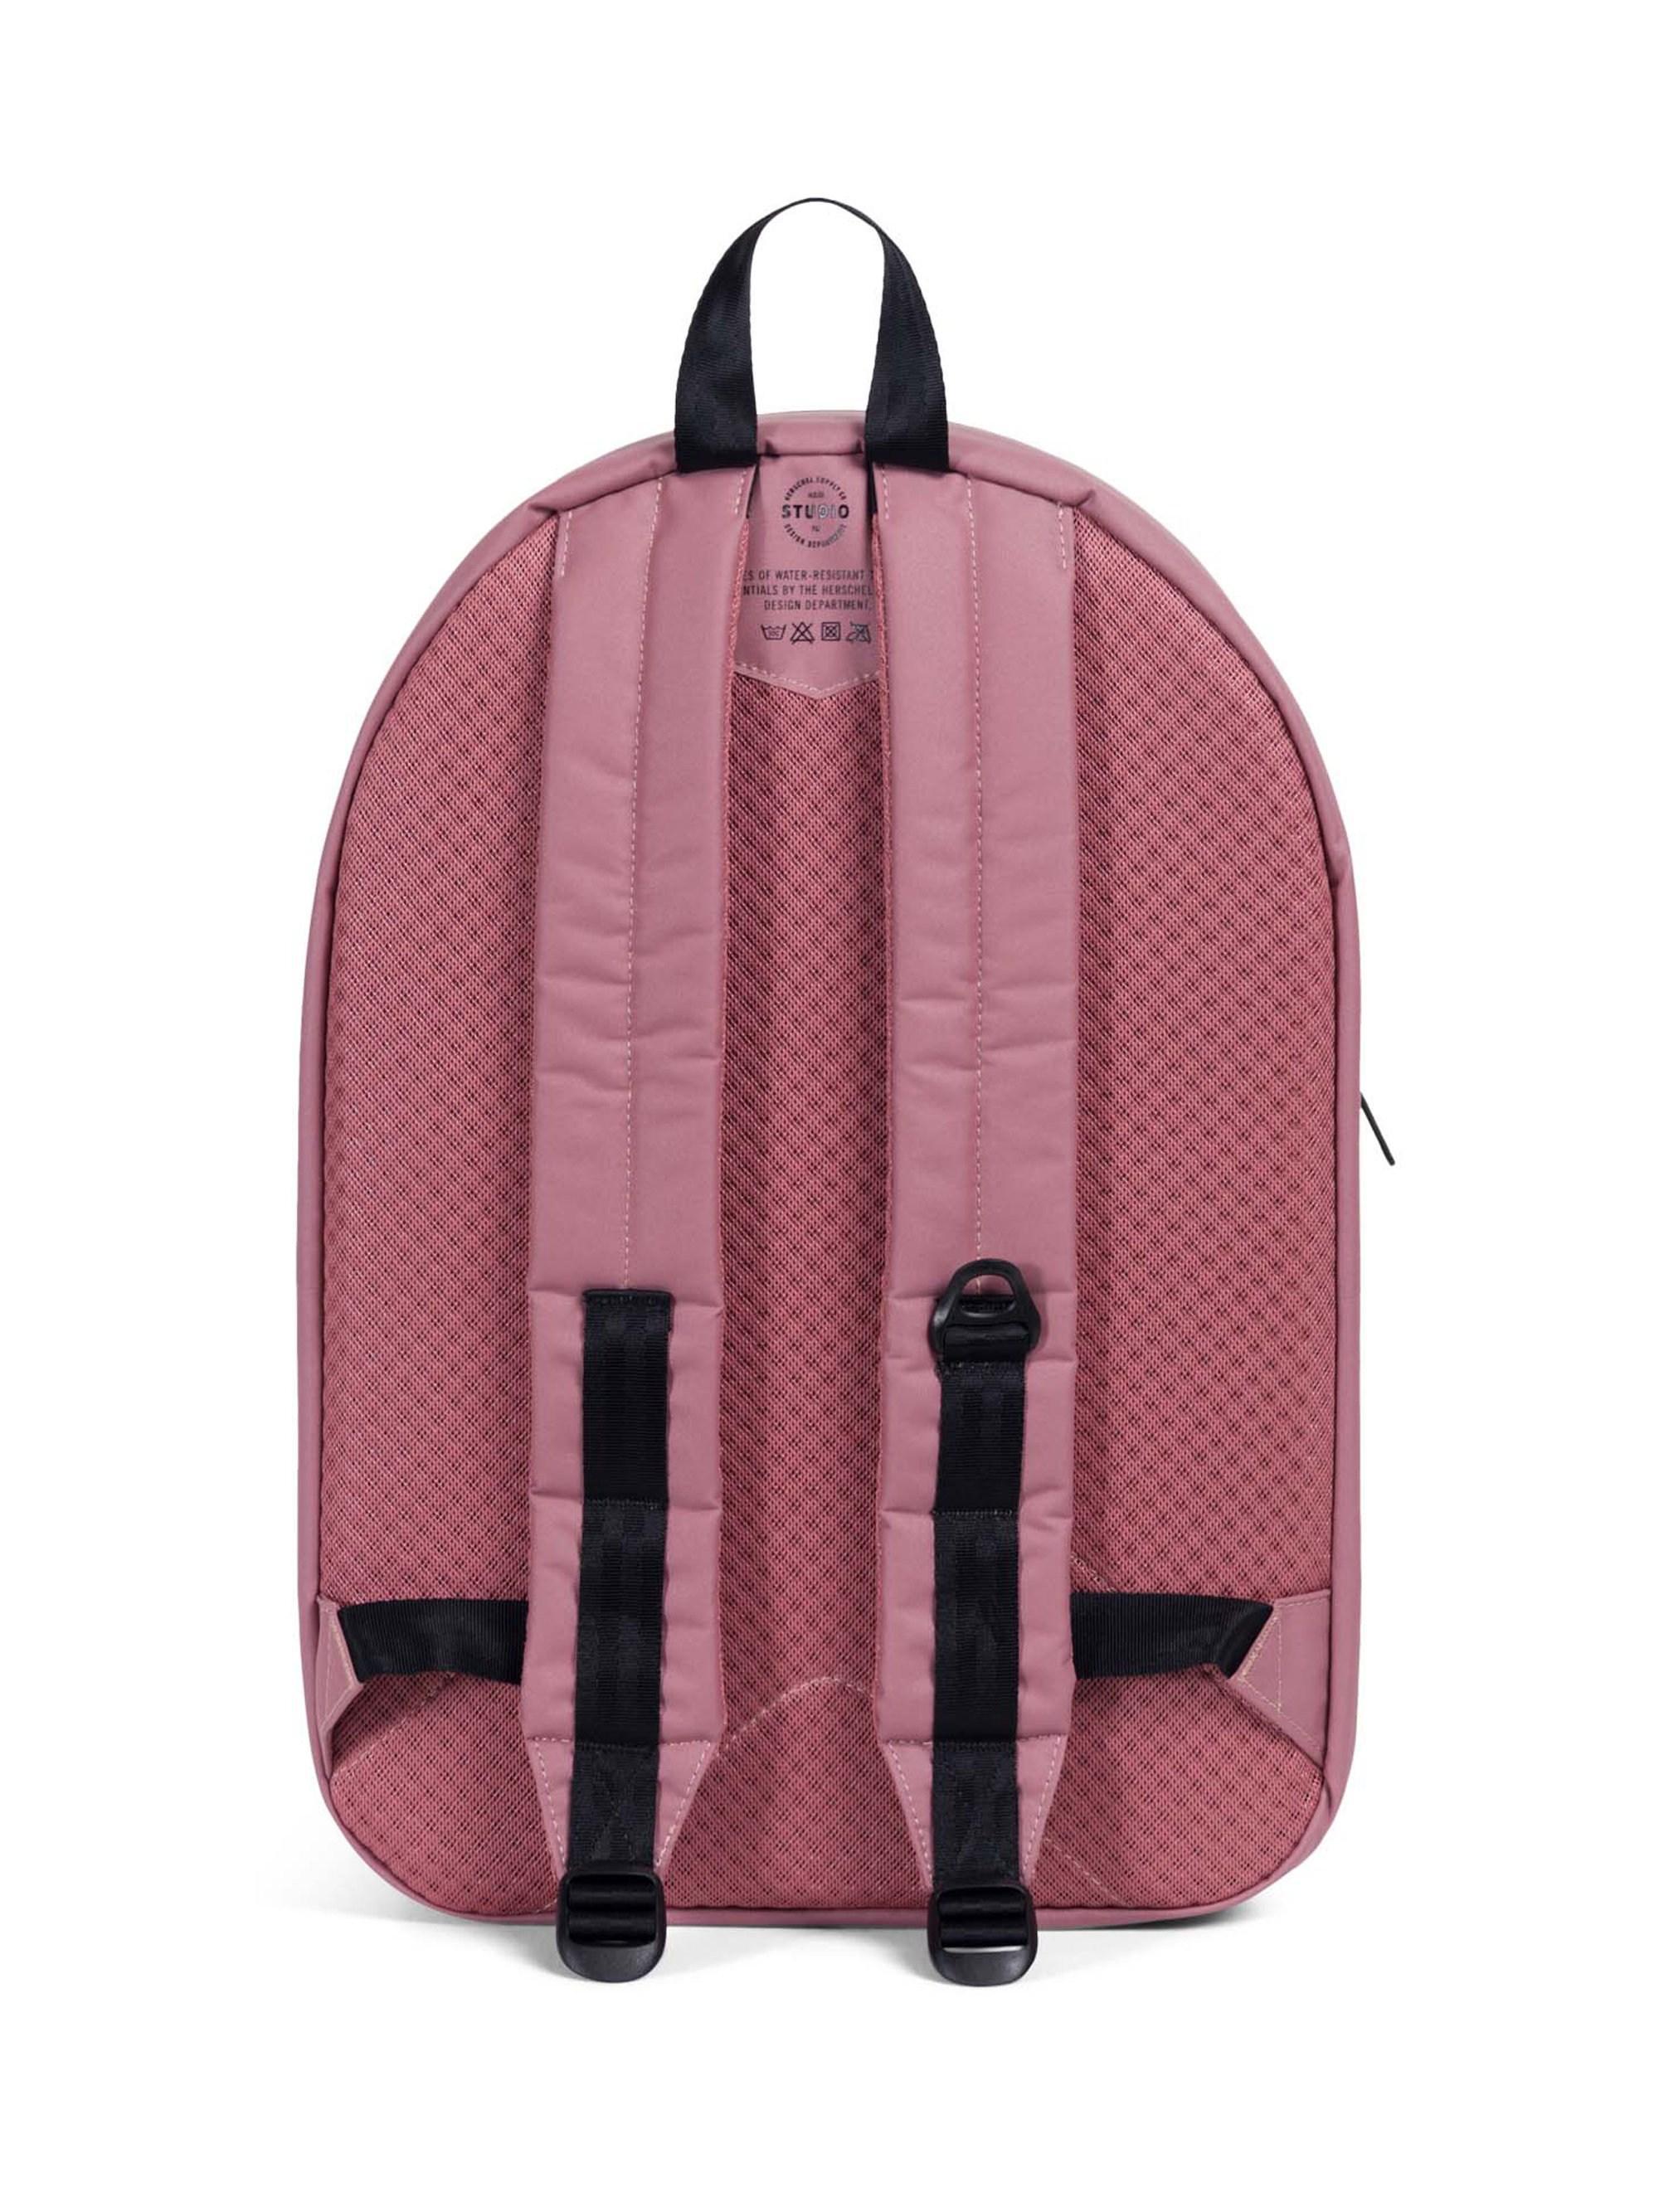 7cee95eb94a Herschel Supply Co. - Pink Men s Settlement Tarpaulin Backpack - Ash Rose  for Men -. View fullscreen